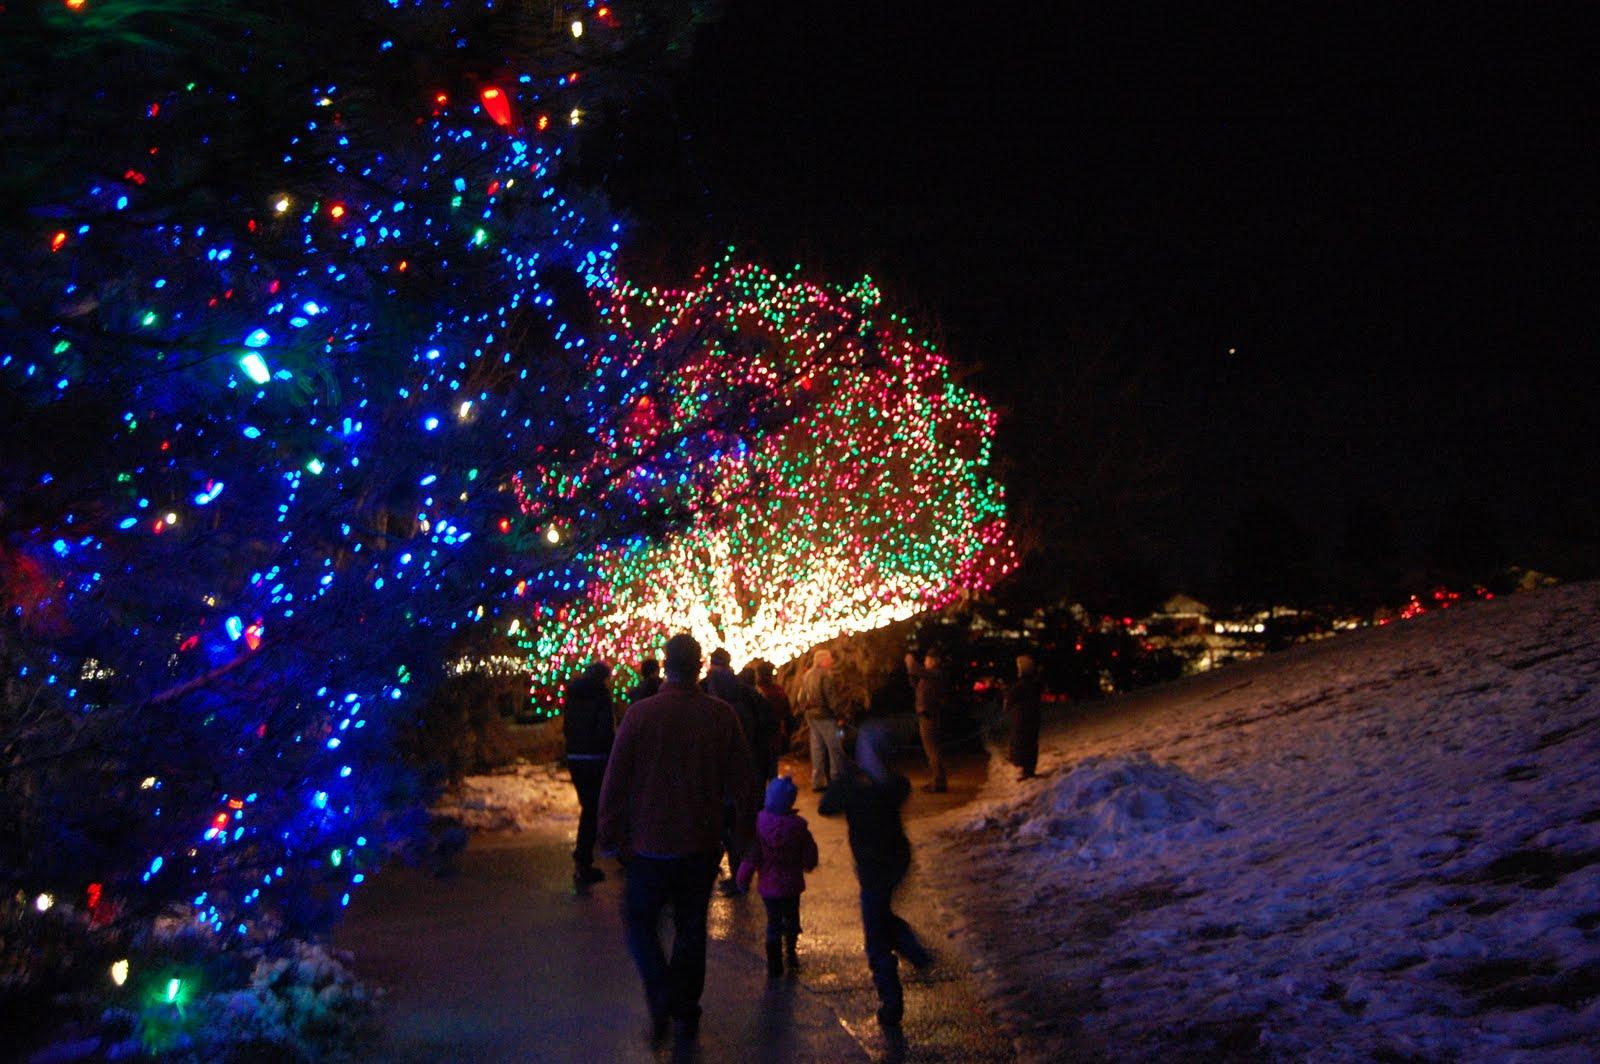 The Bischoffs Denver Botanic Gardens Blossoms Of Light